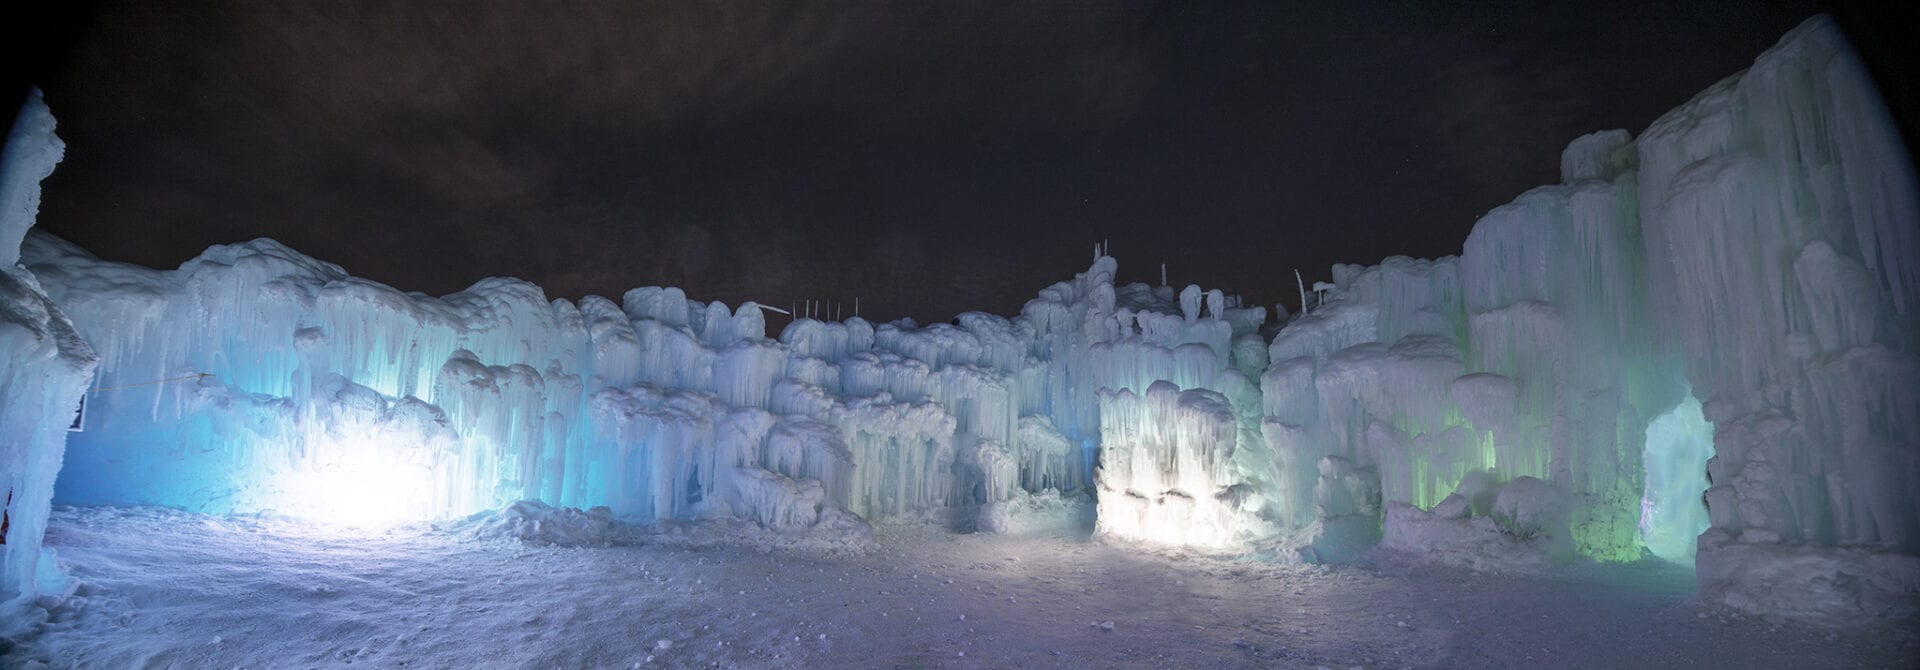 edmonton ice castles panorama